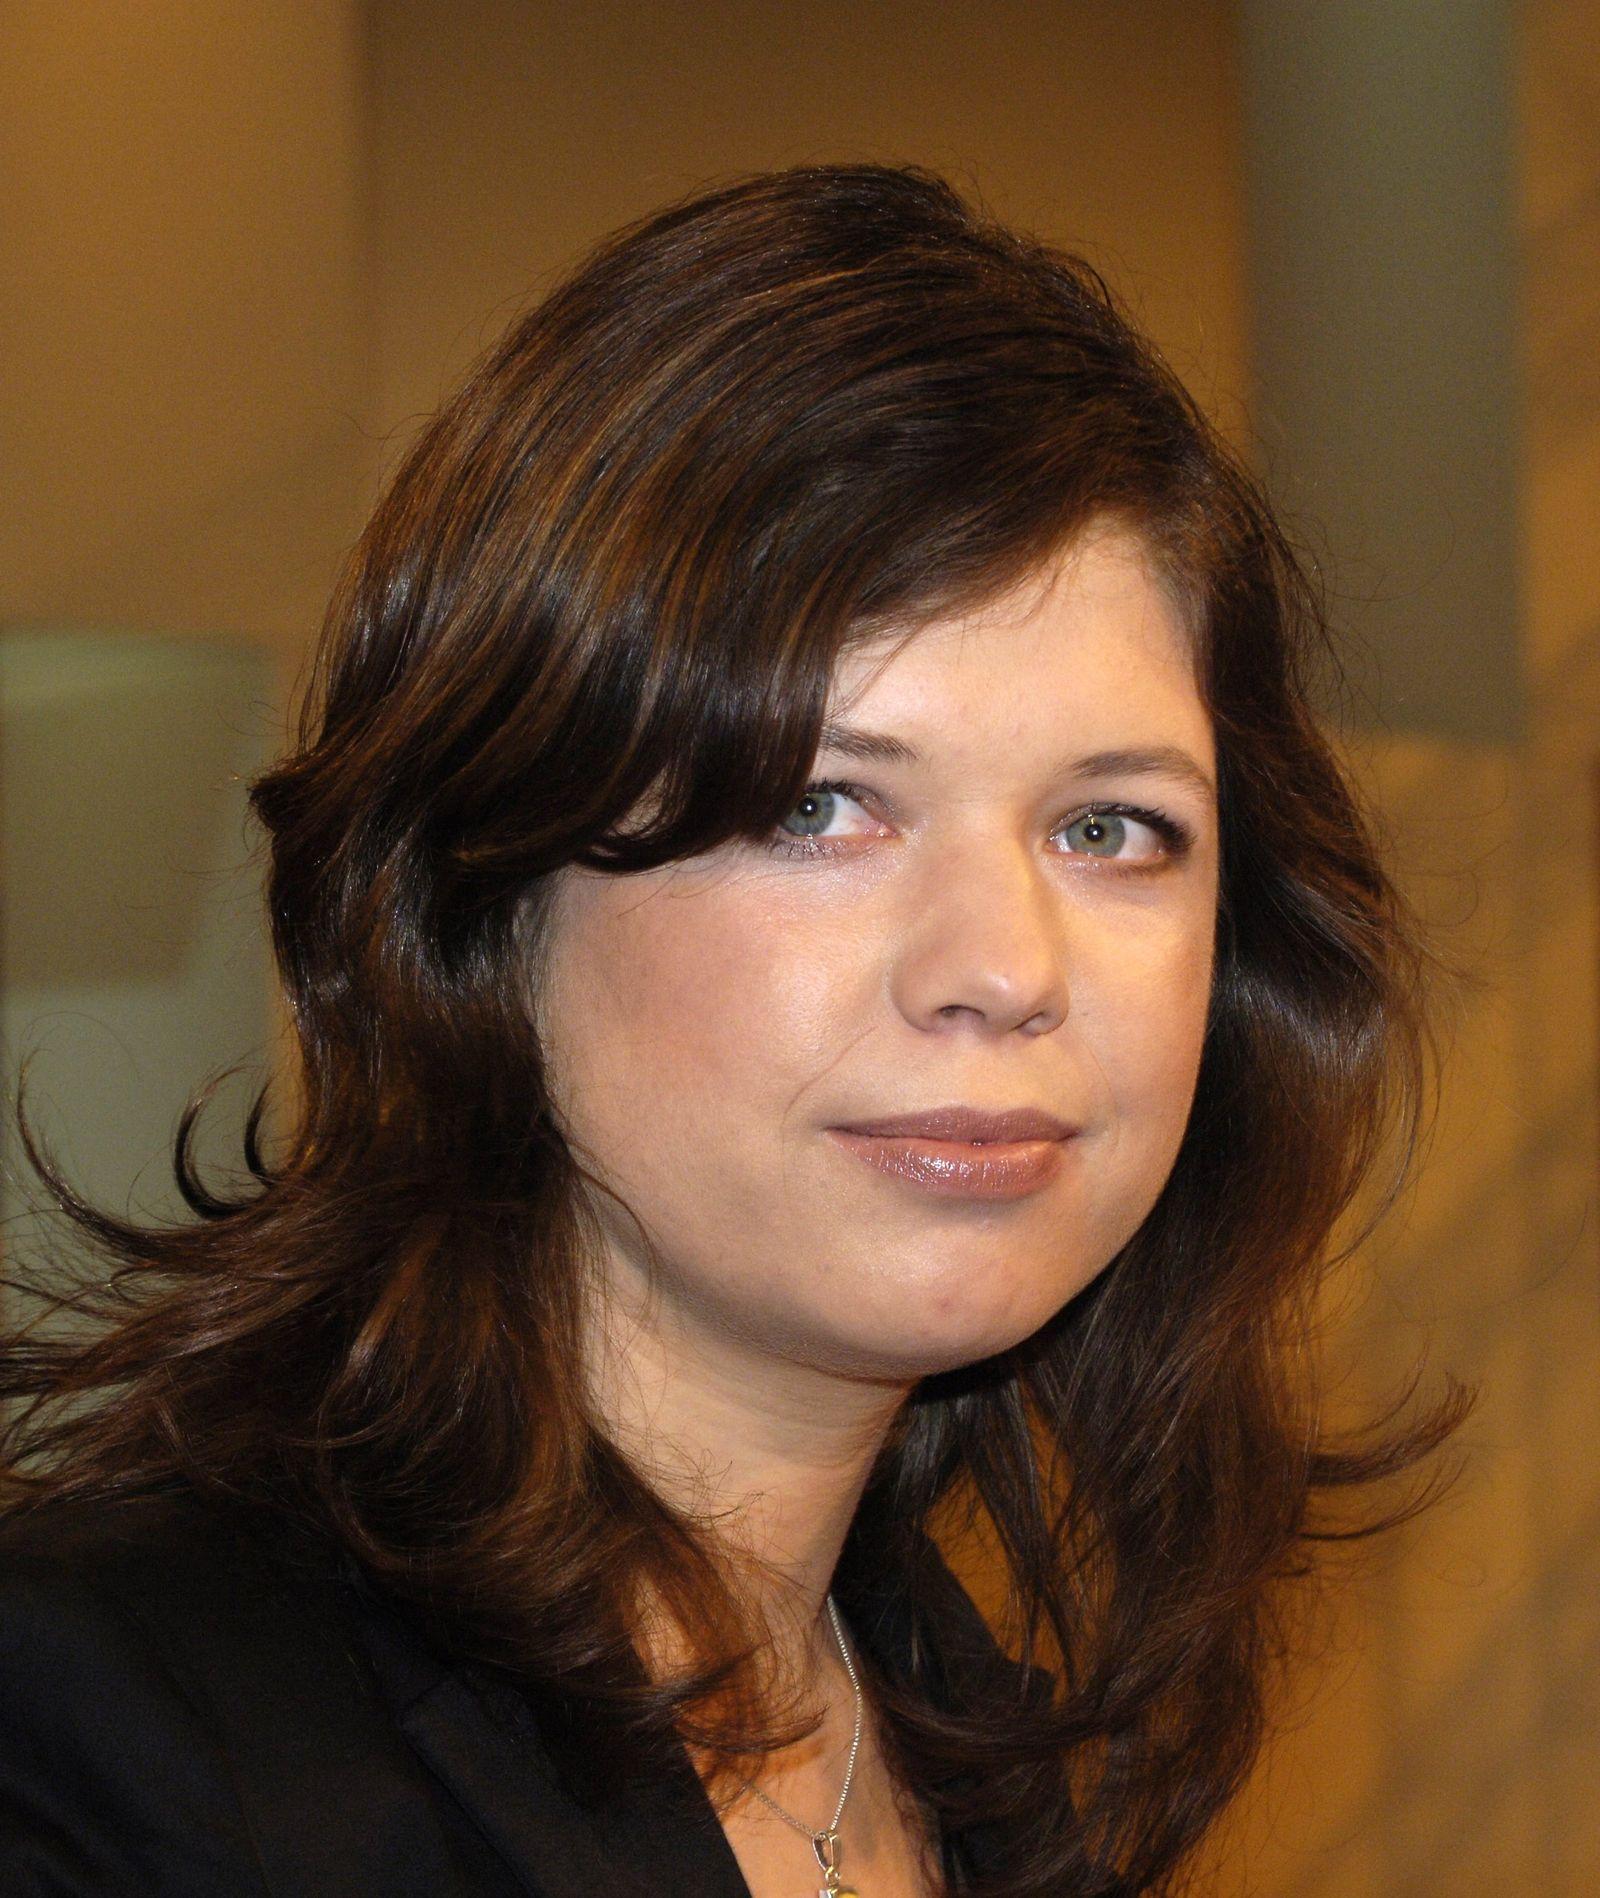 Julia Friedrichs